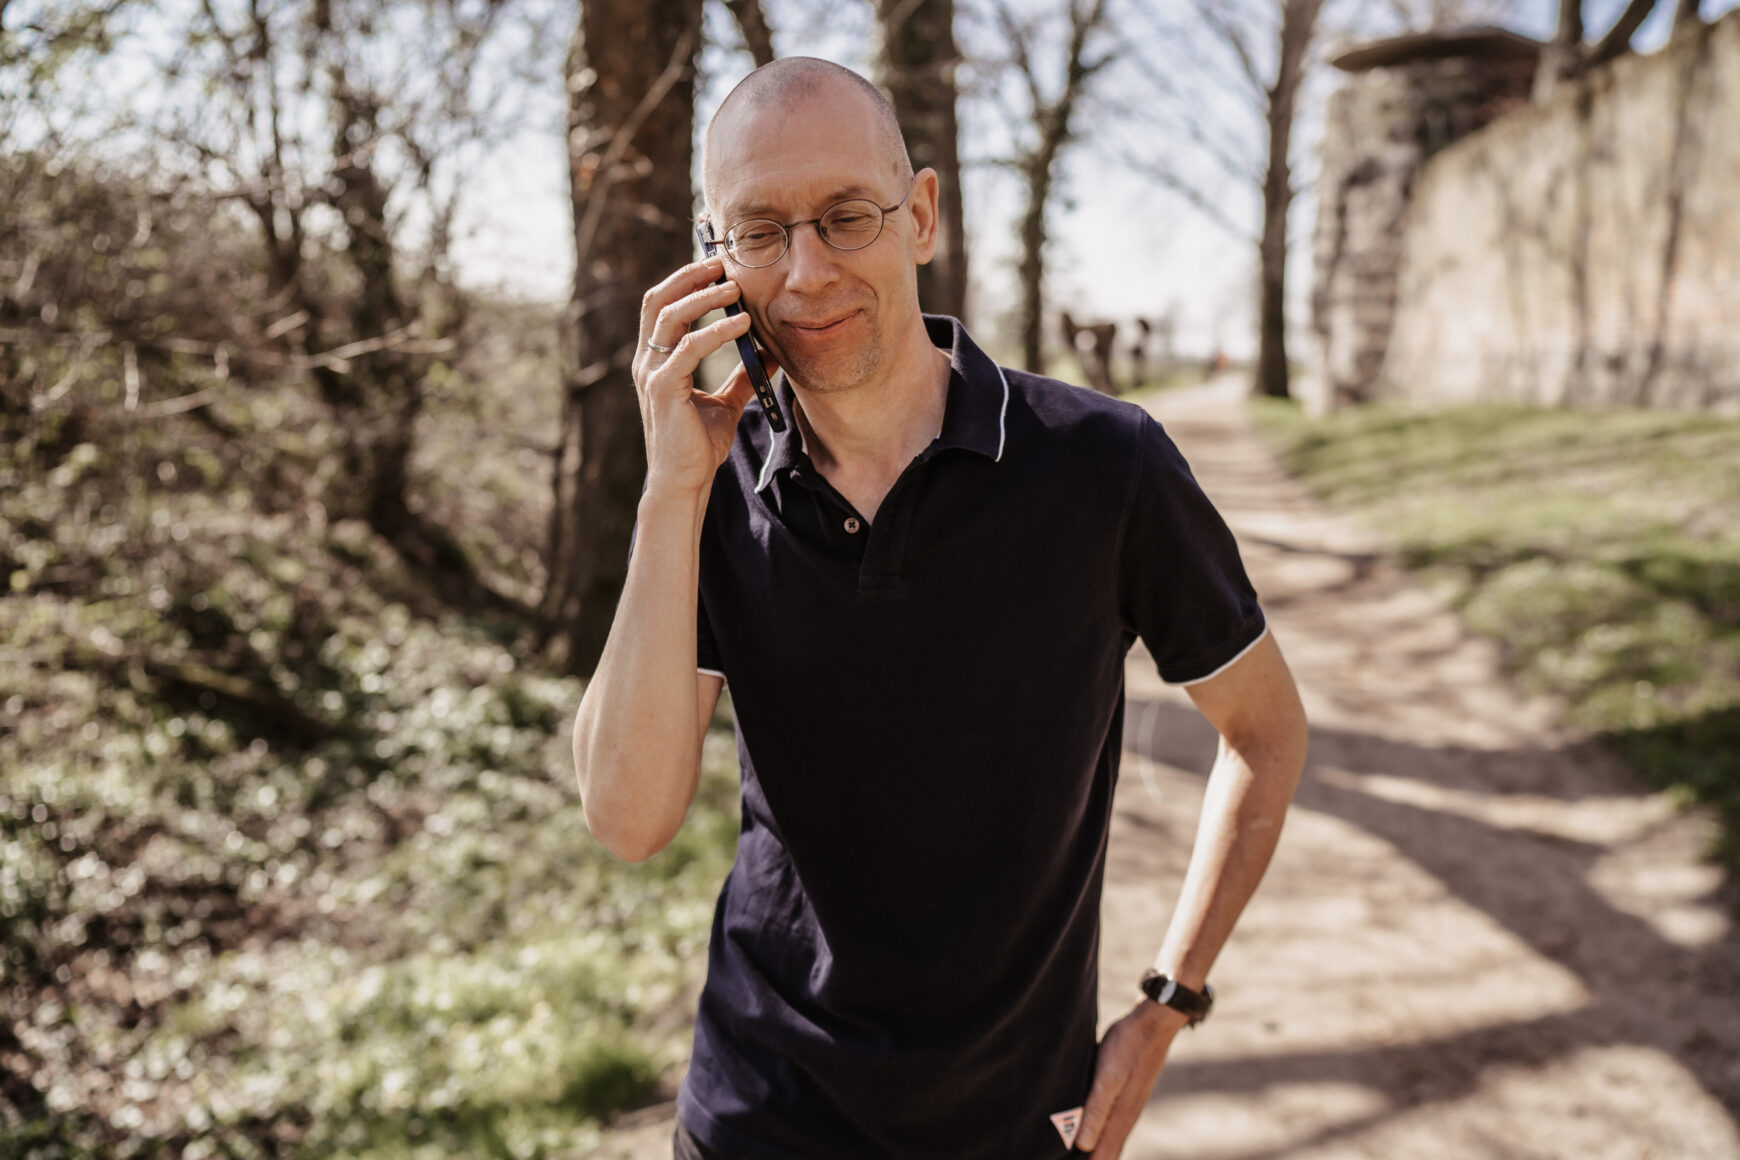 ChristophHonig BeratungBuchhandel Beratung Telefon